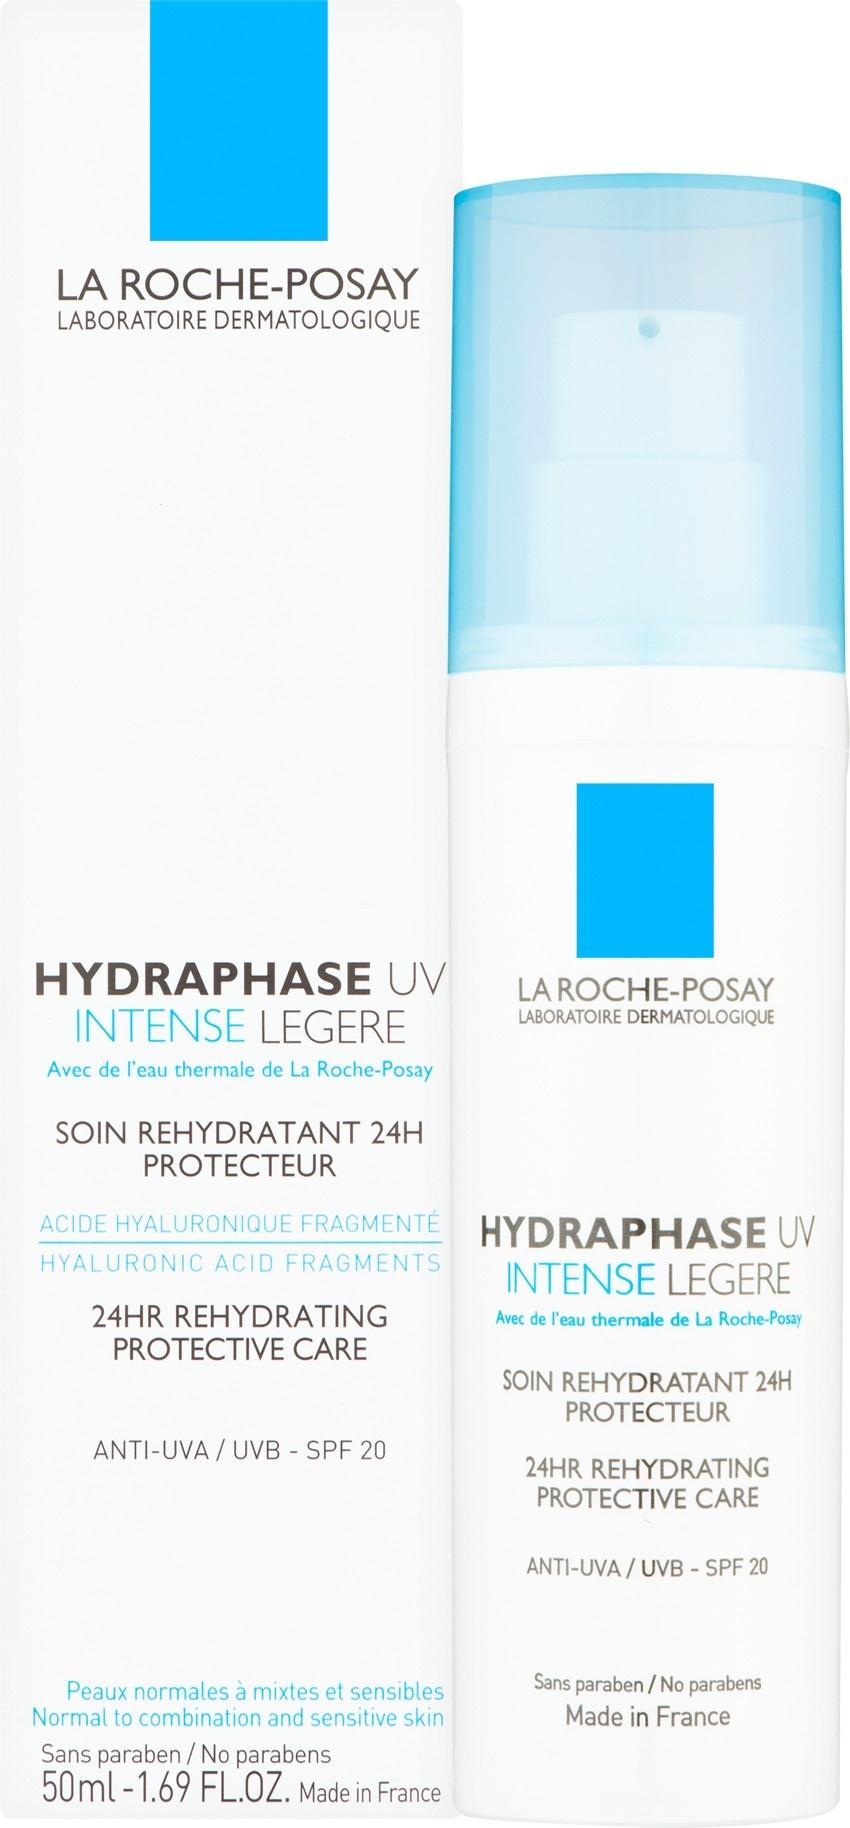 La Roche-Posay Hydraphase UV Intense Legere - Light - SPF20, 50ml